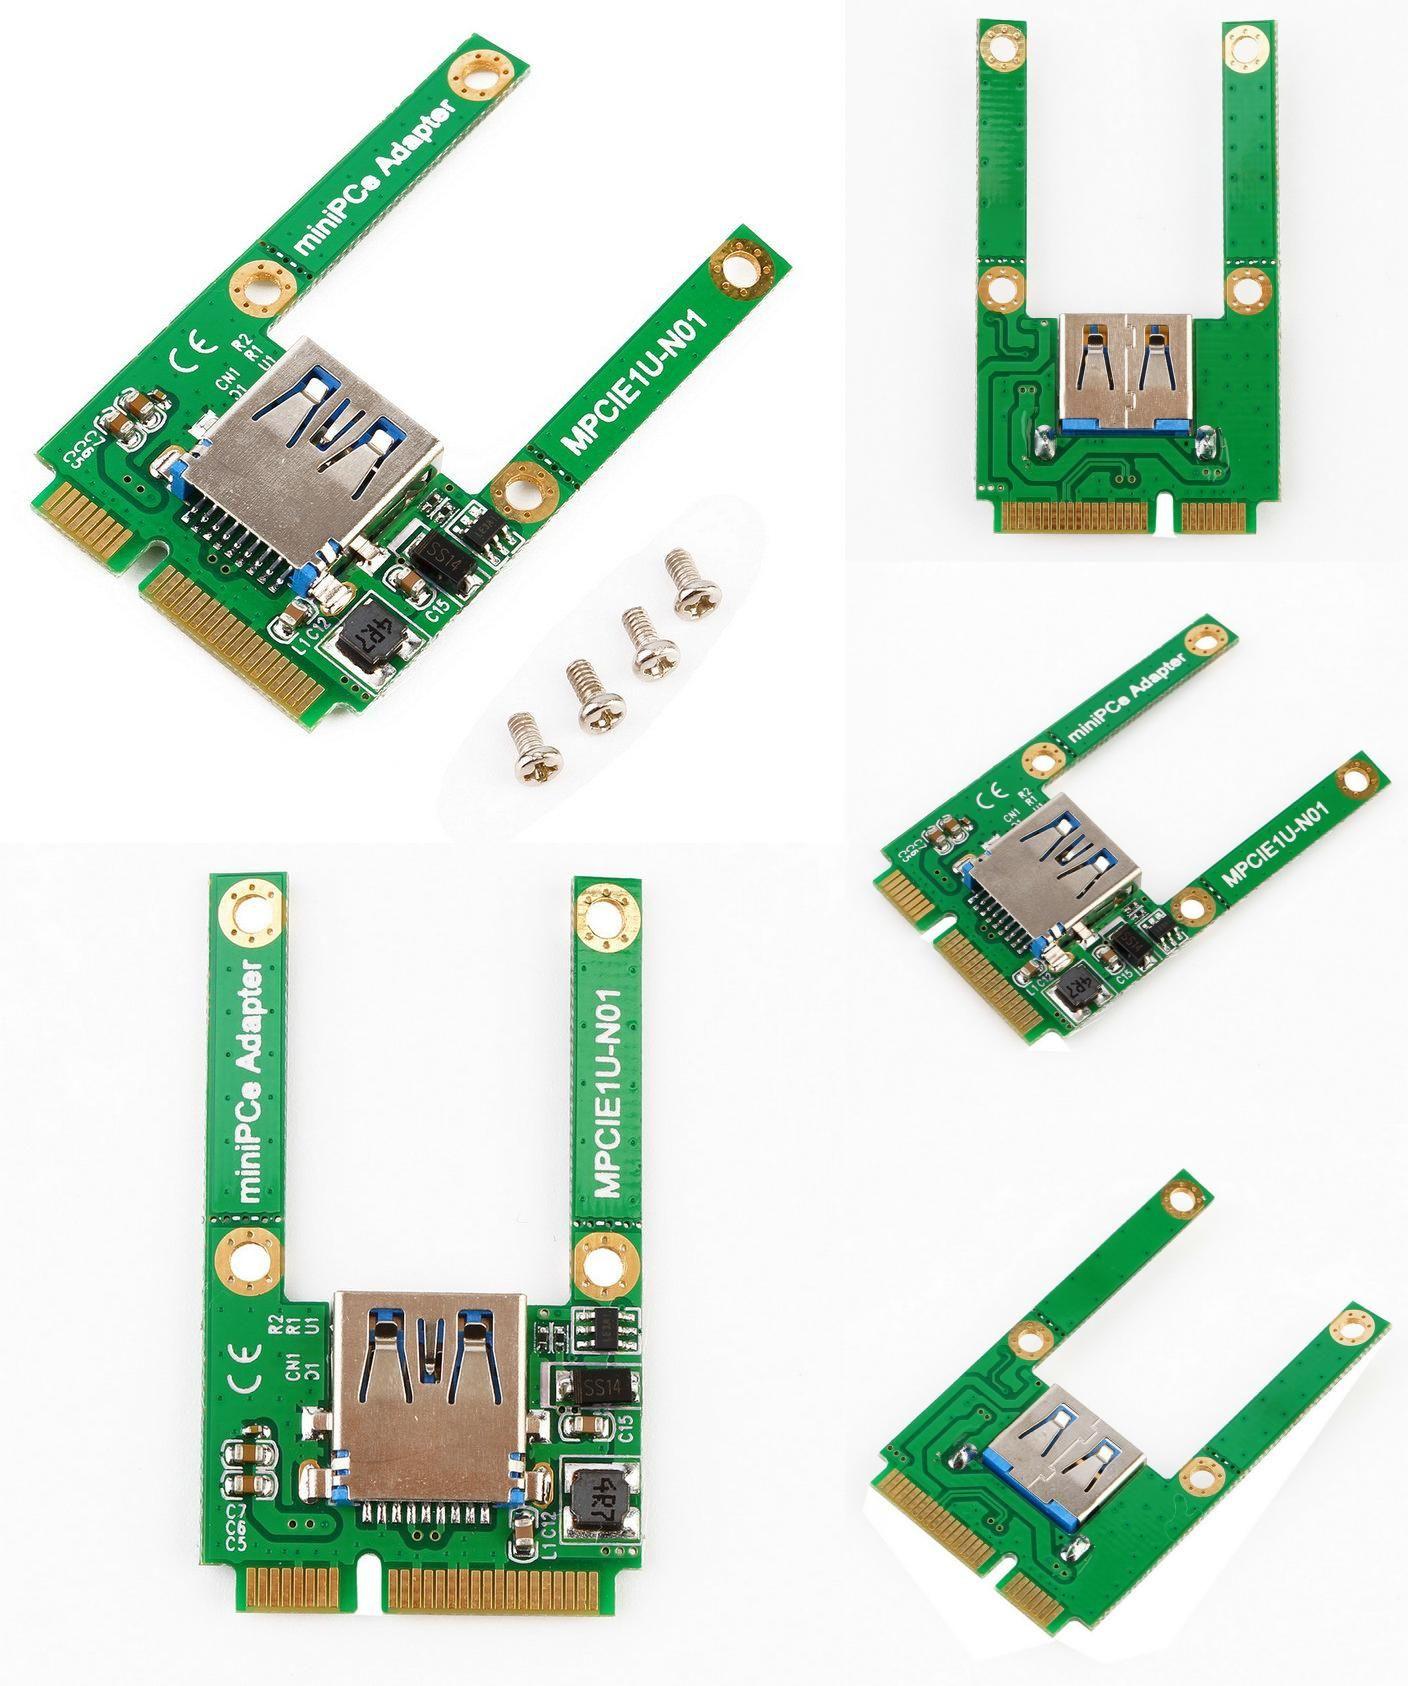 Hot Mini PCI-E Card Slot Expansion to USB 2.0 Interface Adapter Riser Card